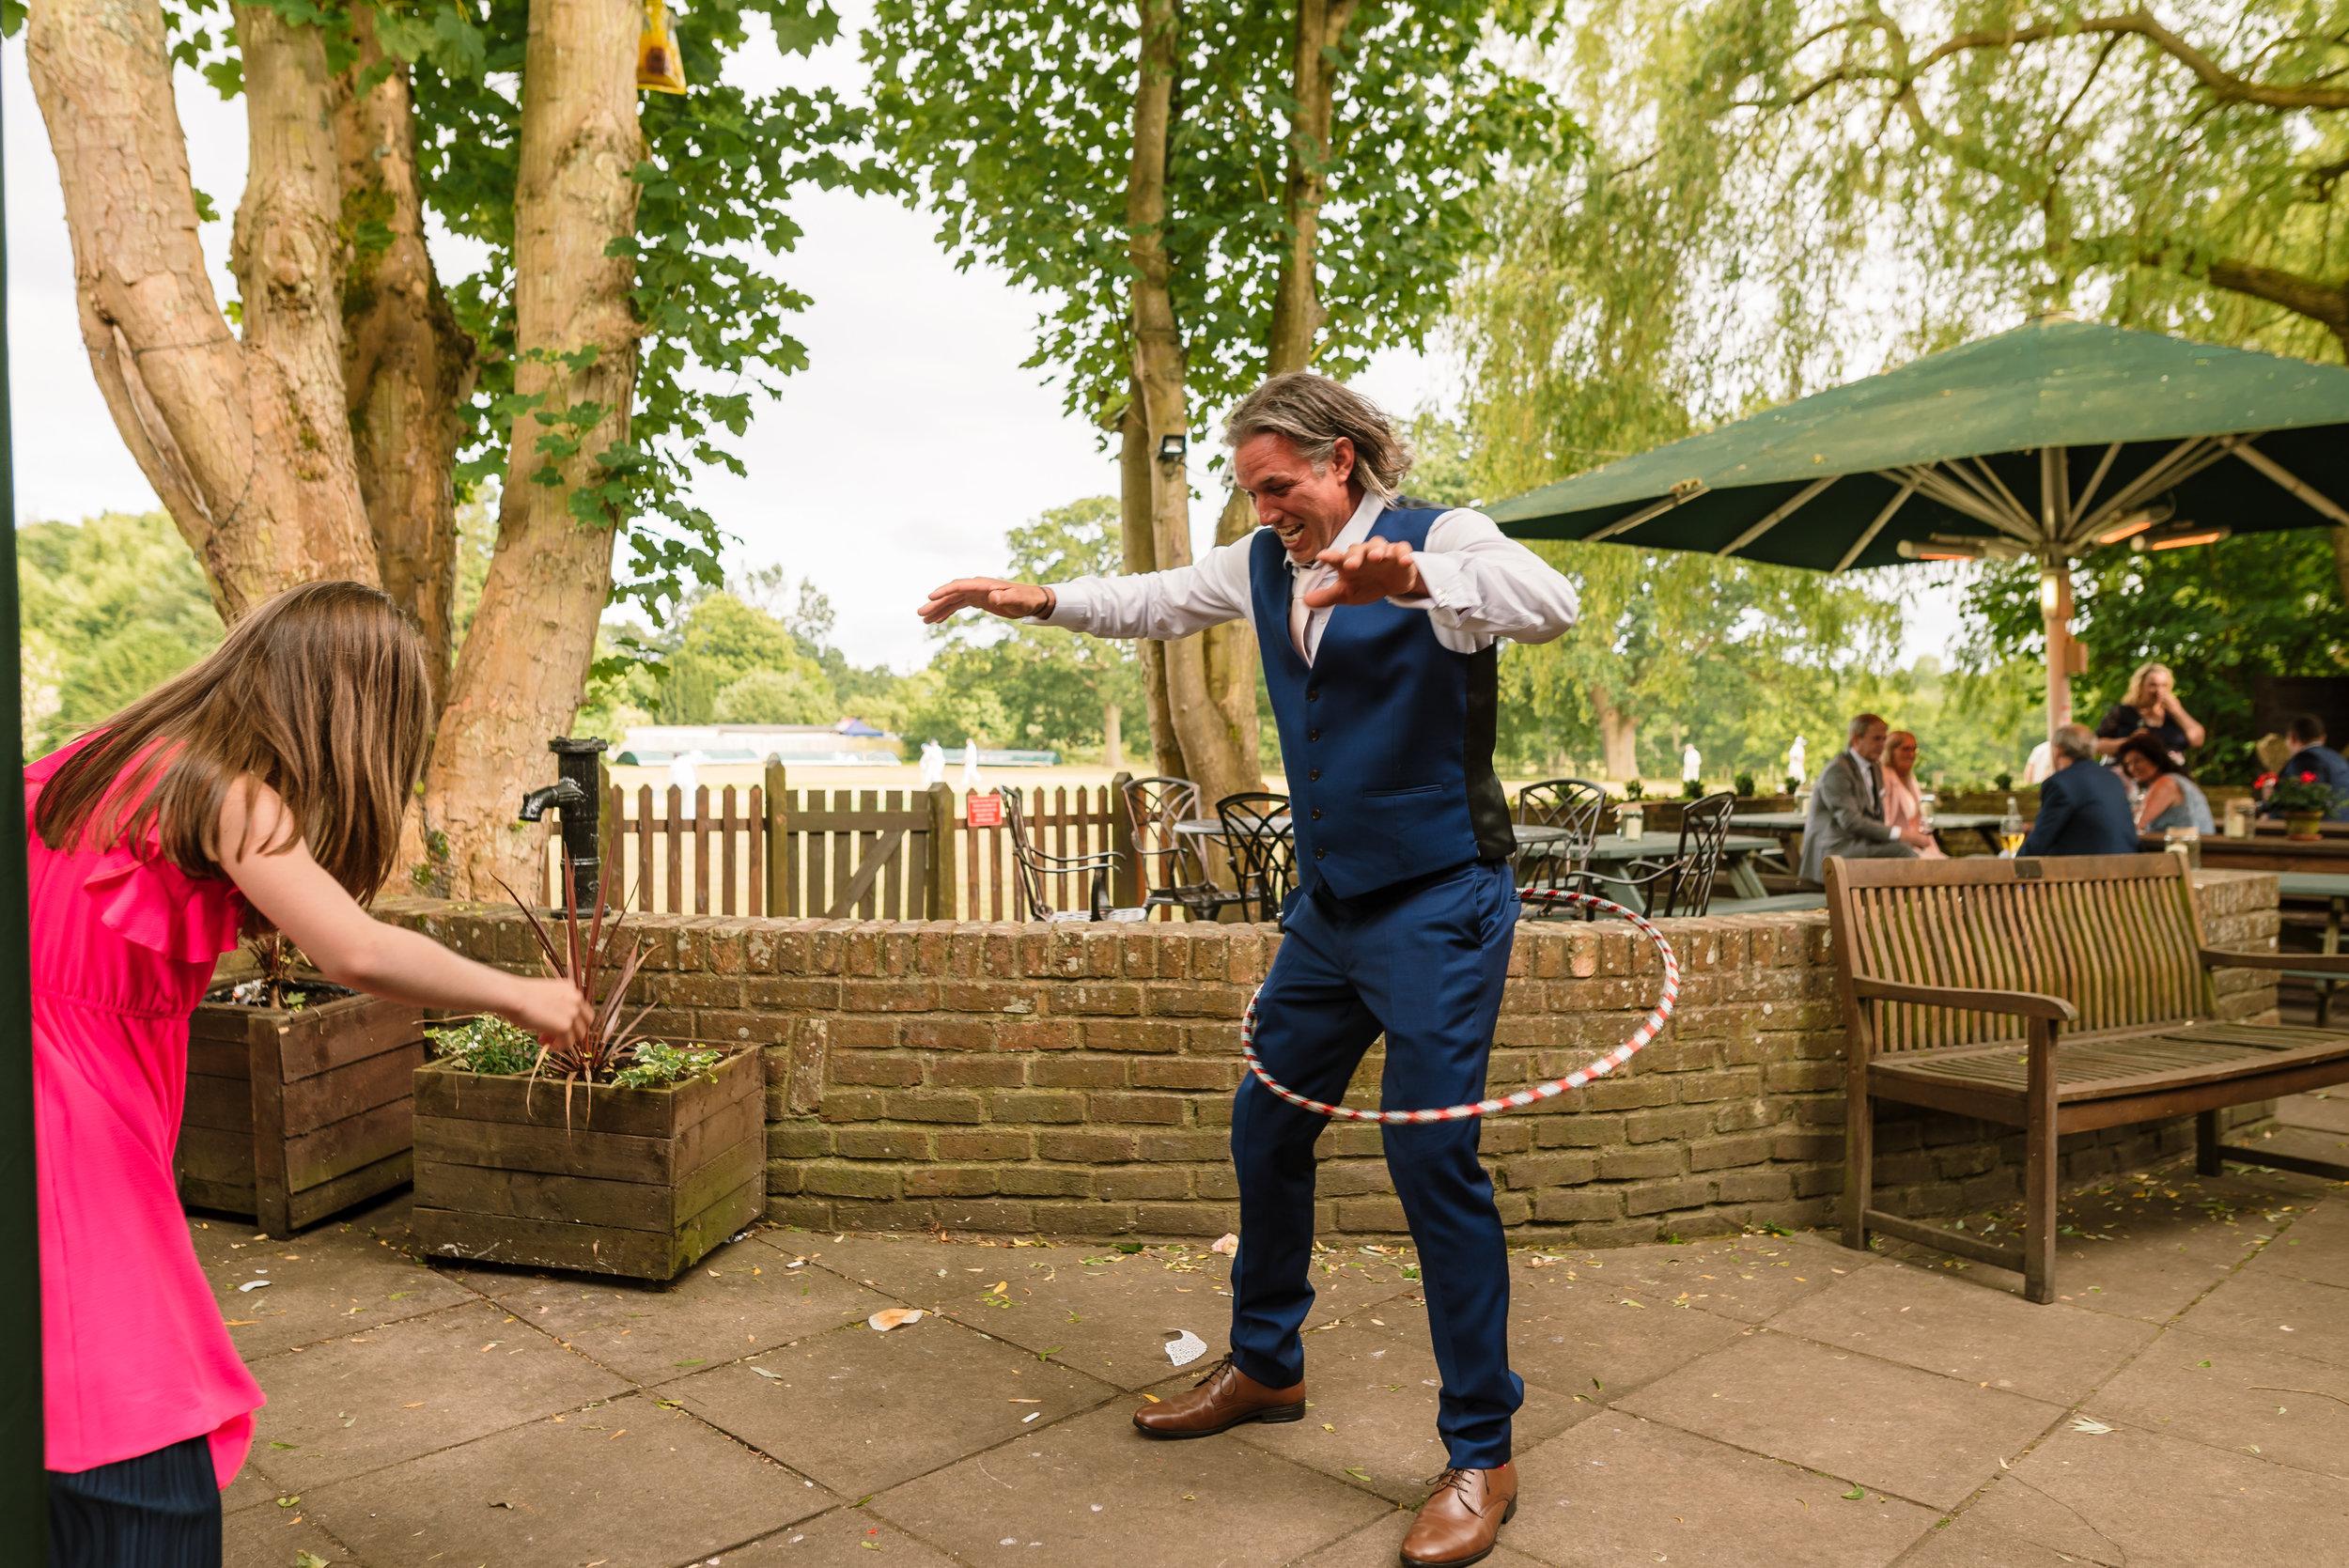 Sarah-Fishlock-Photography : Hampshire-wedding-photographer-hampshire : fleet-wedding-photographer-fleet : Meade-Hall-Wedding-Photographer : Meade-Hall-Wedding-Photos-965.jpg